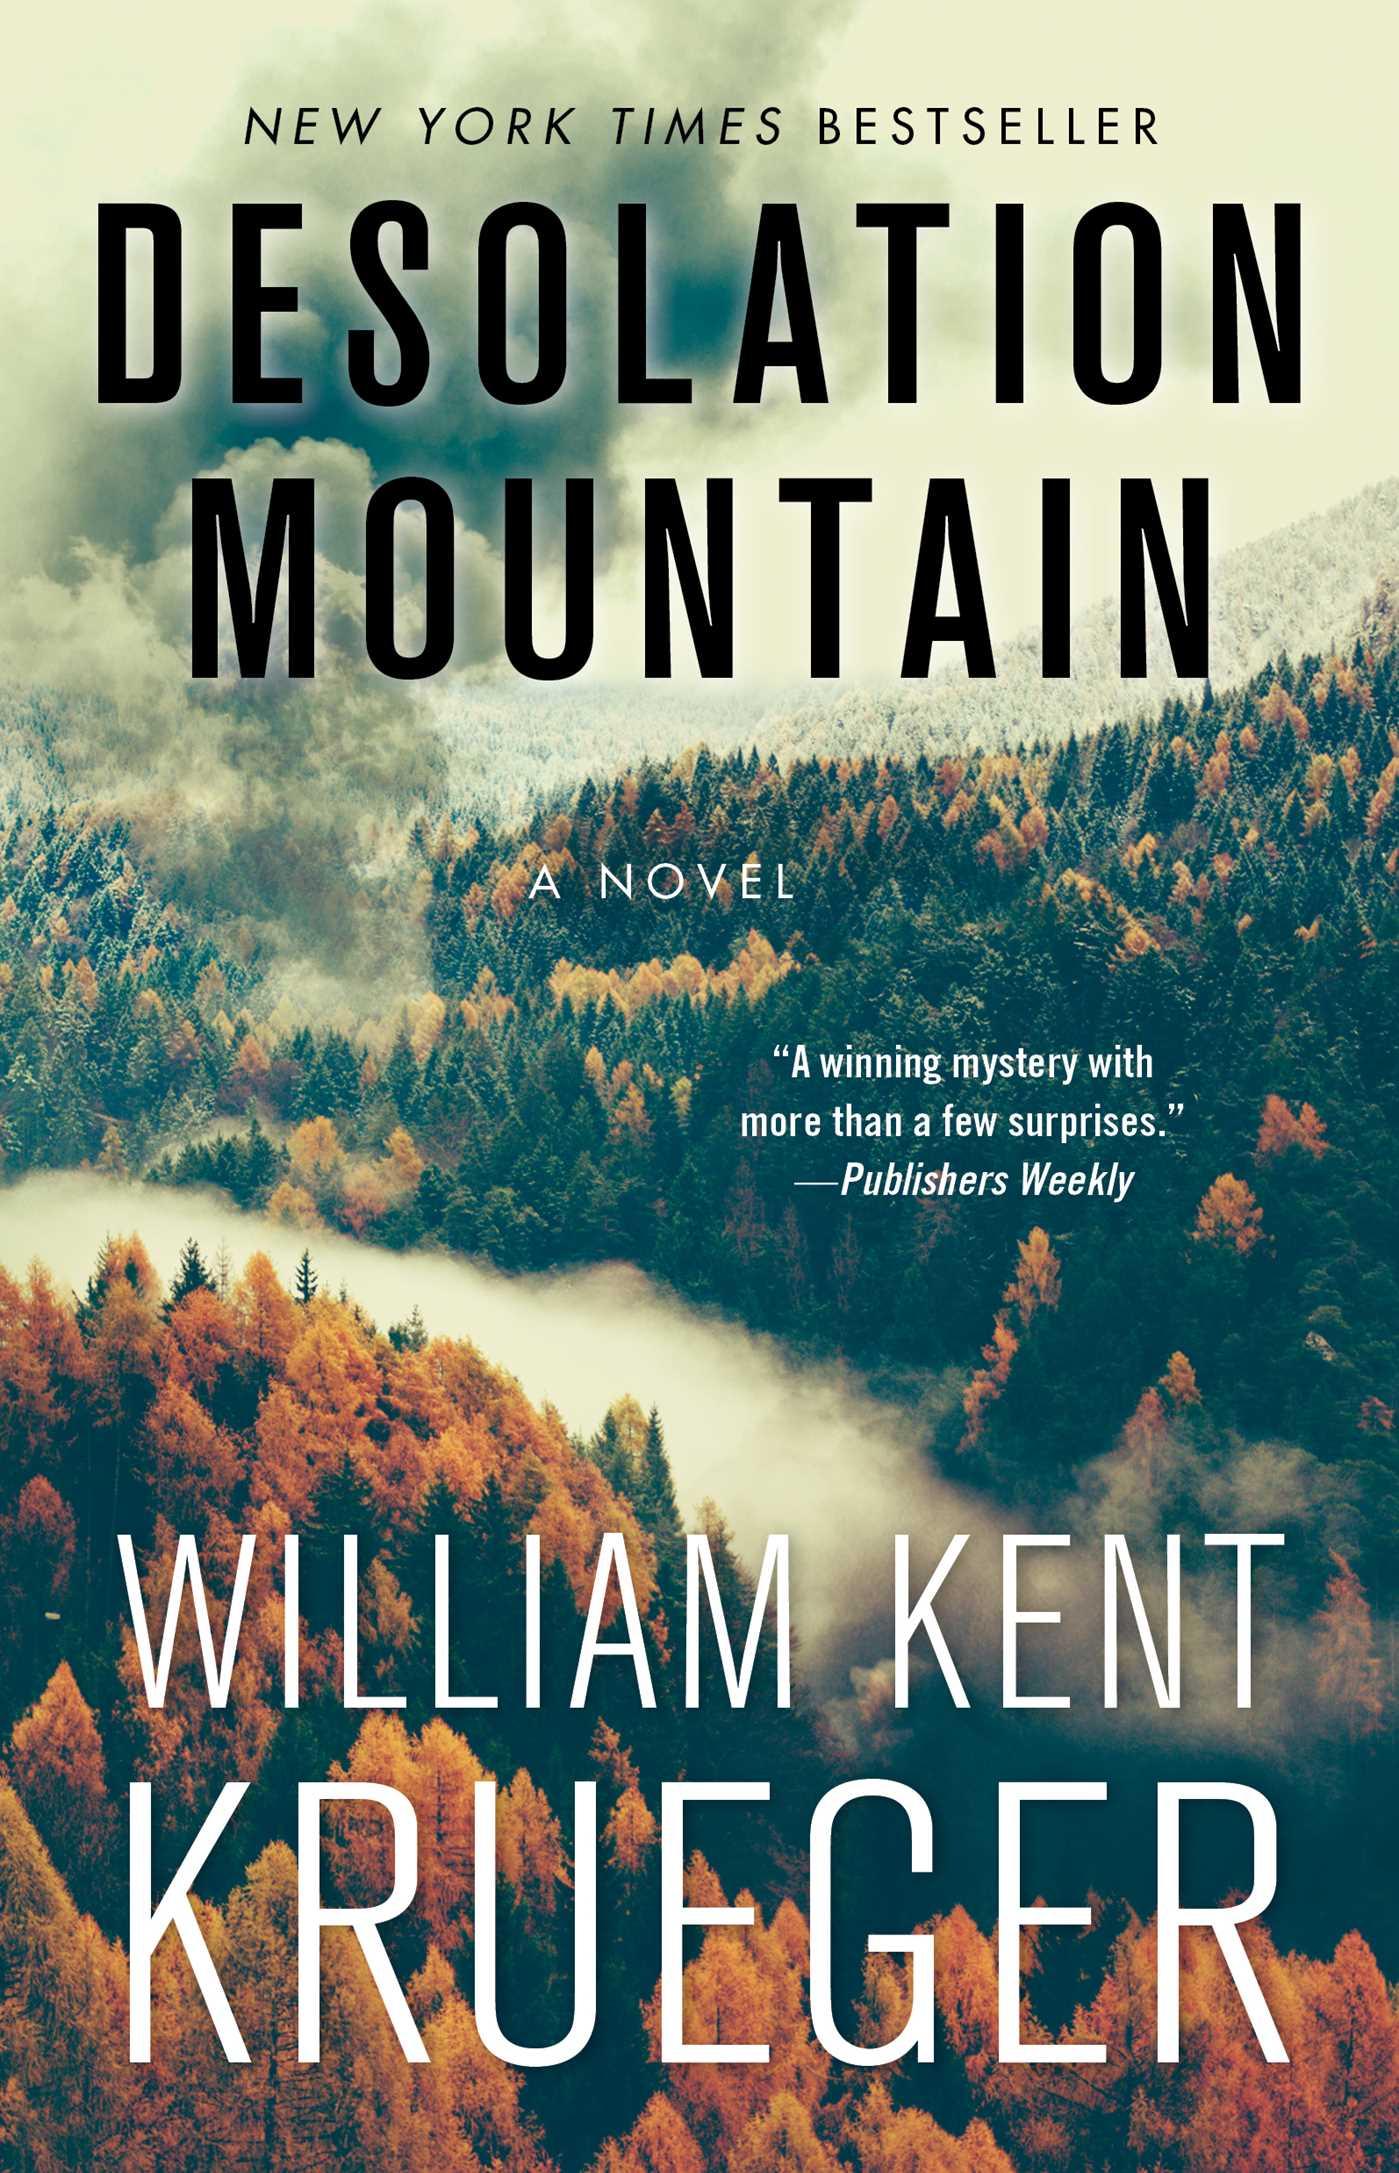 Desolation mountain 9781501147470 hr